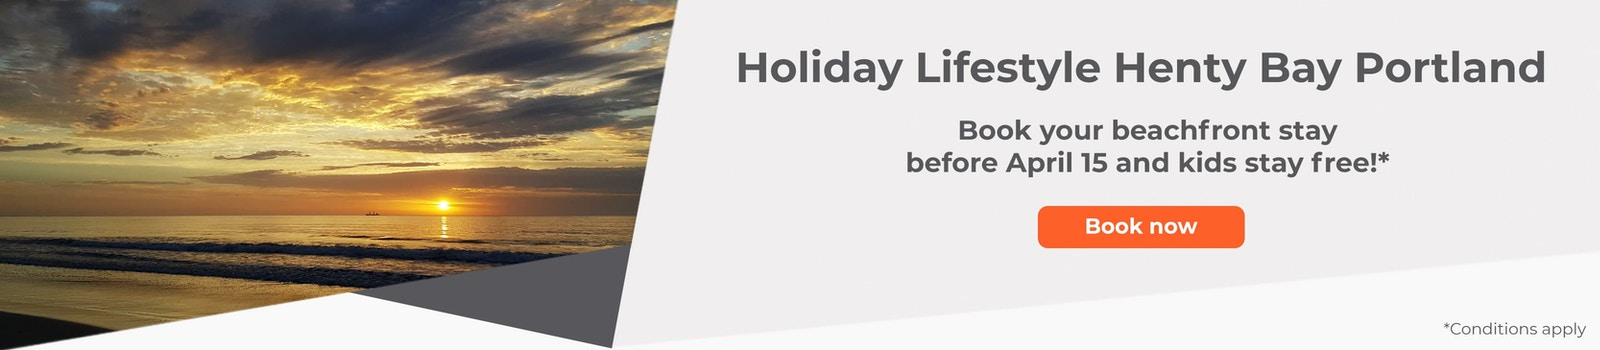 Holiday Lifestyle Henty Bay Portland